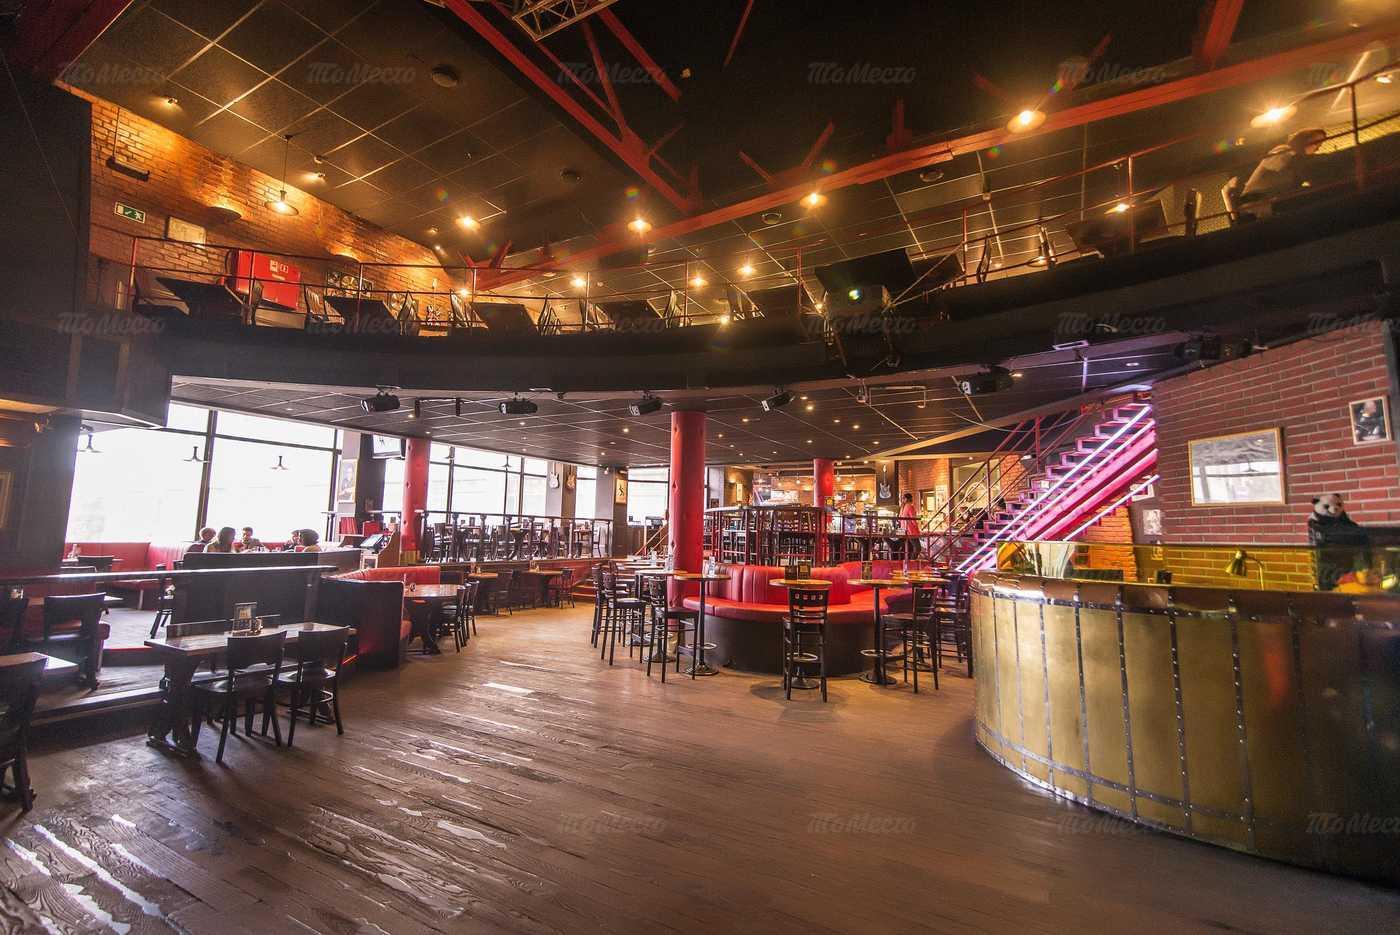 Меню бара, ночного клуба, ресторана Jagger на площади Конституции